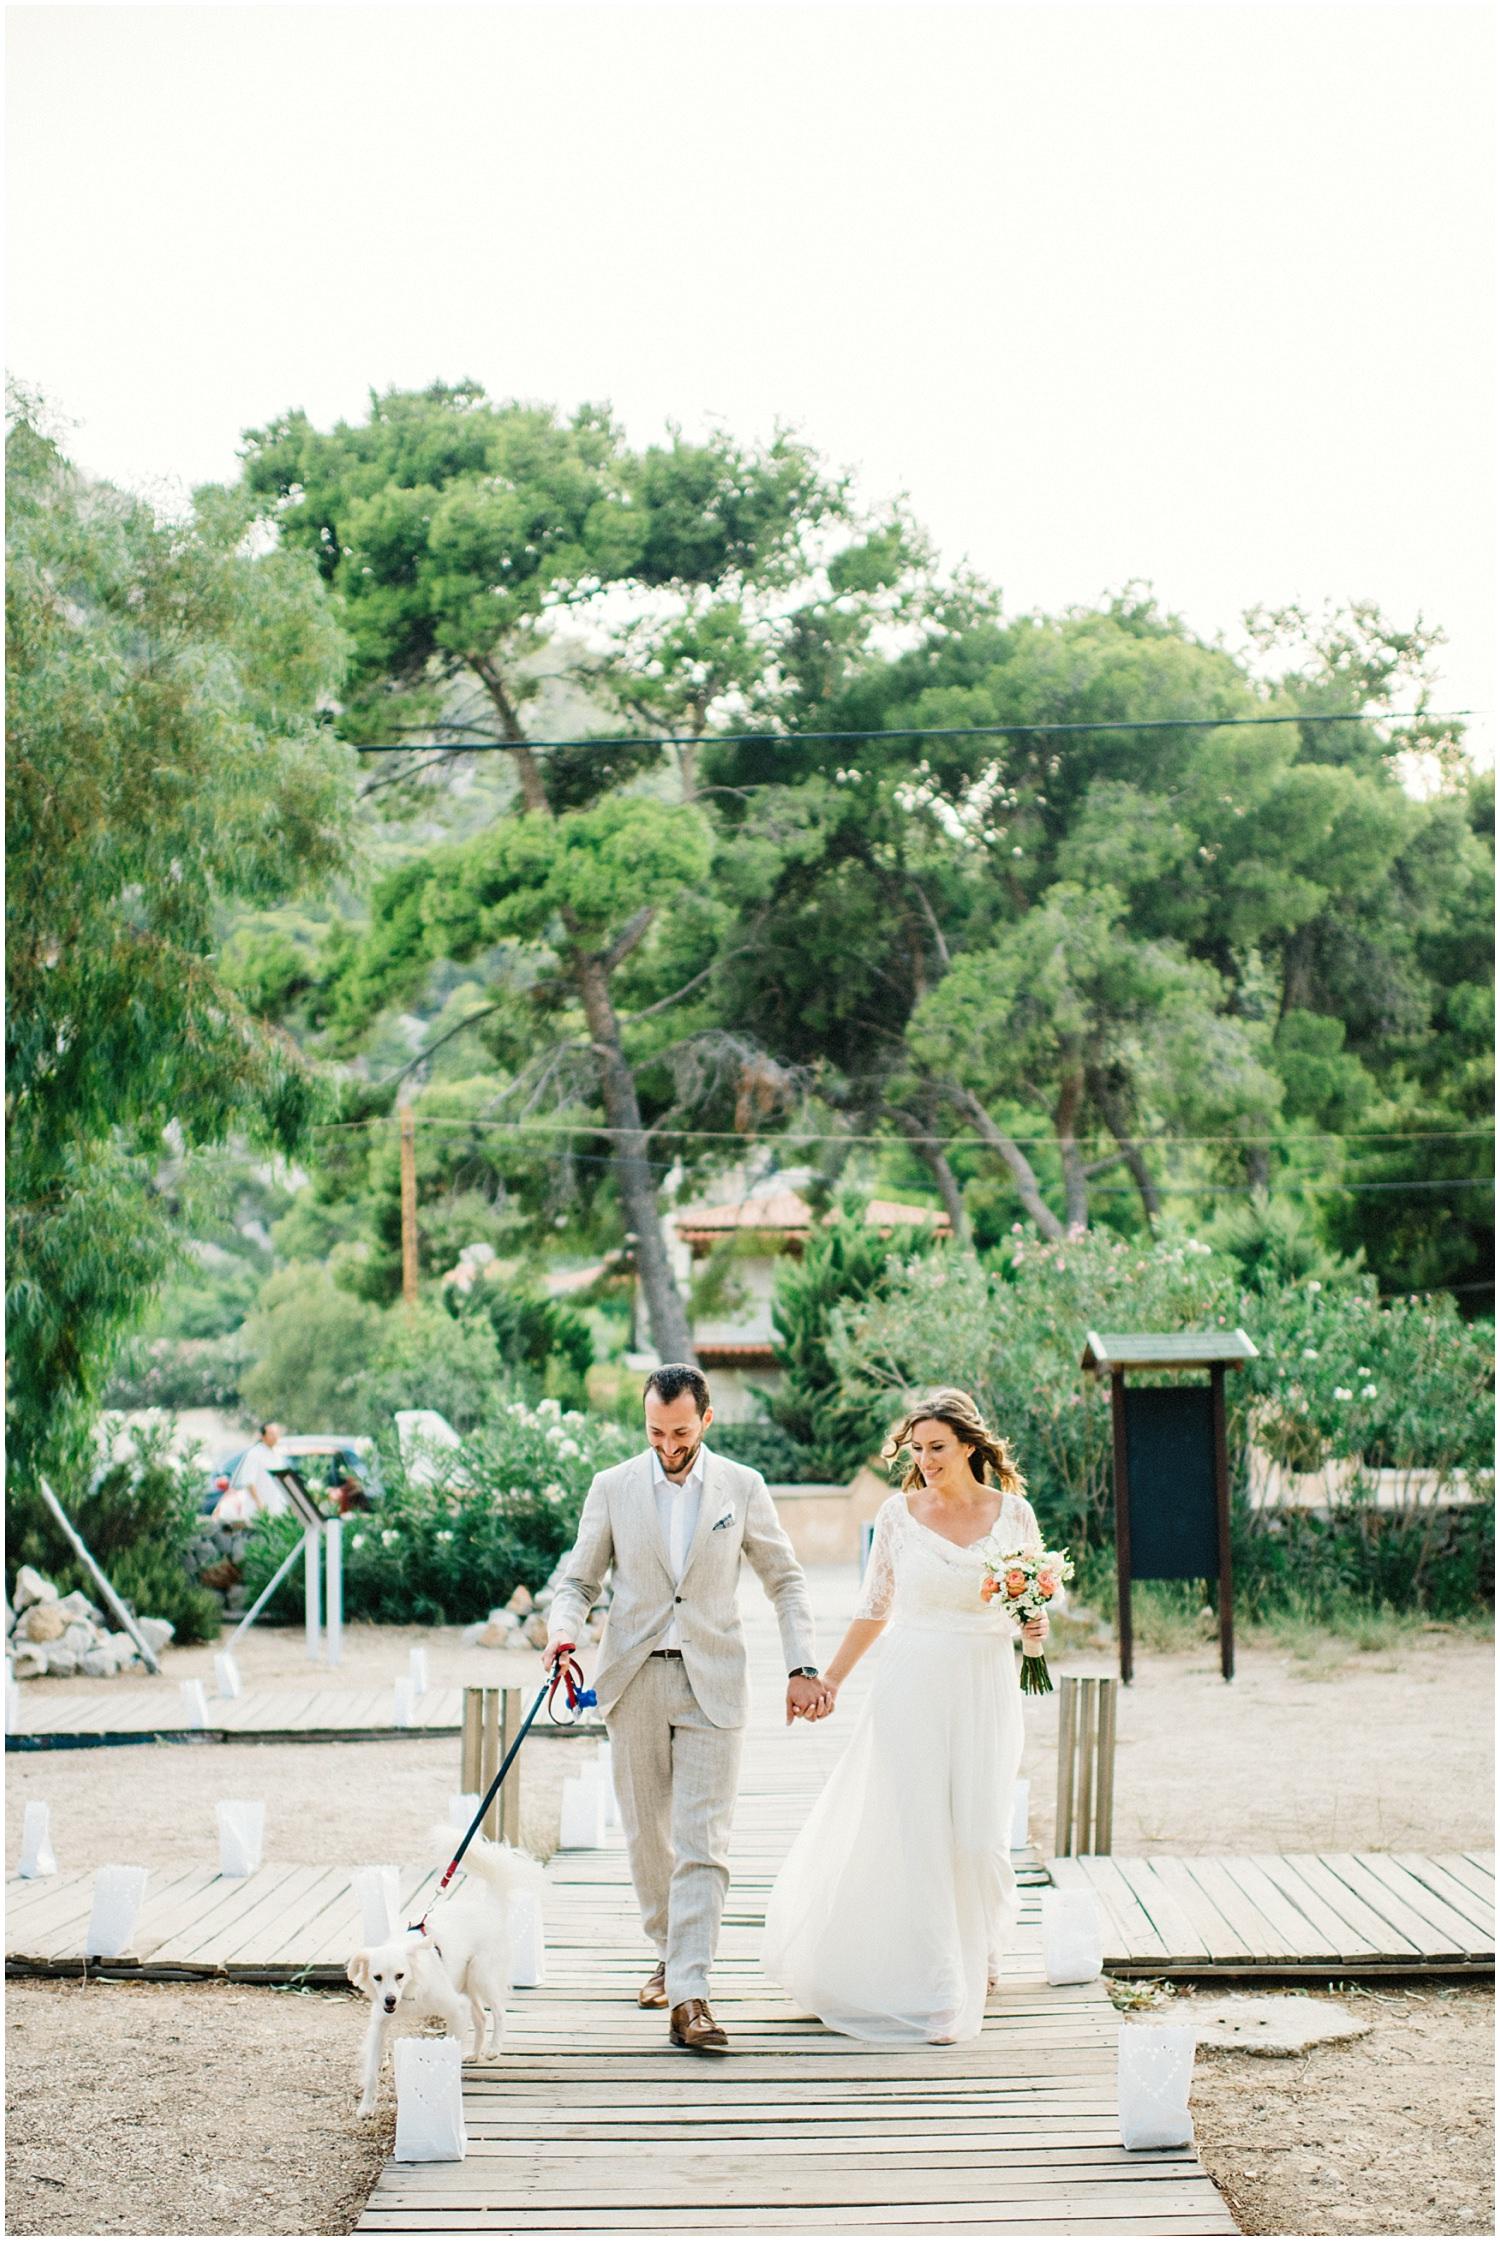 Wedding By The Sea Greece 47